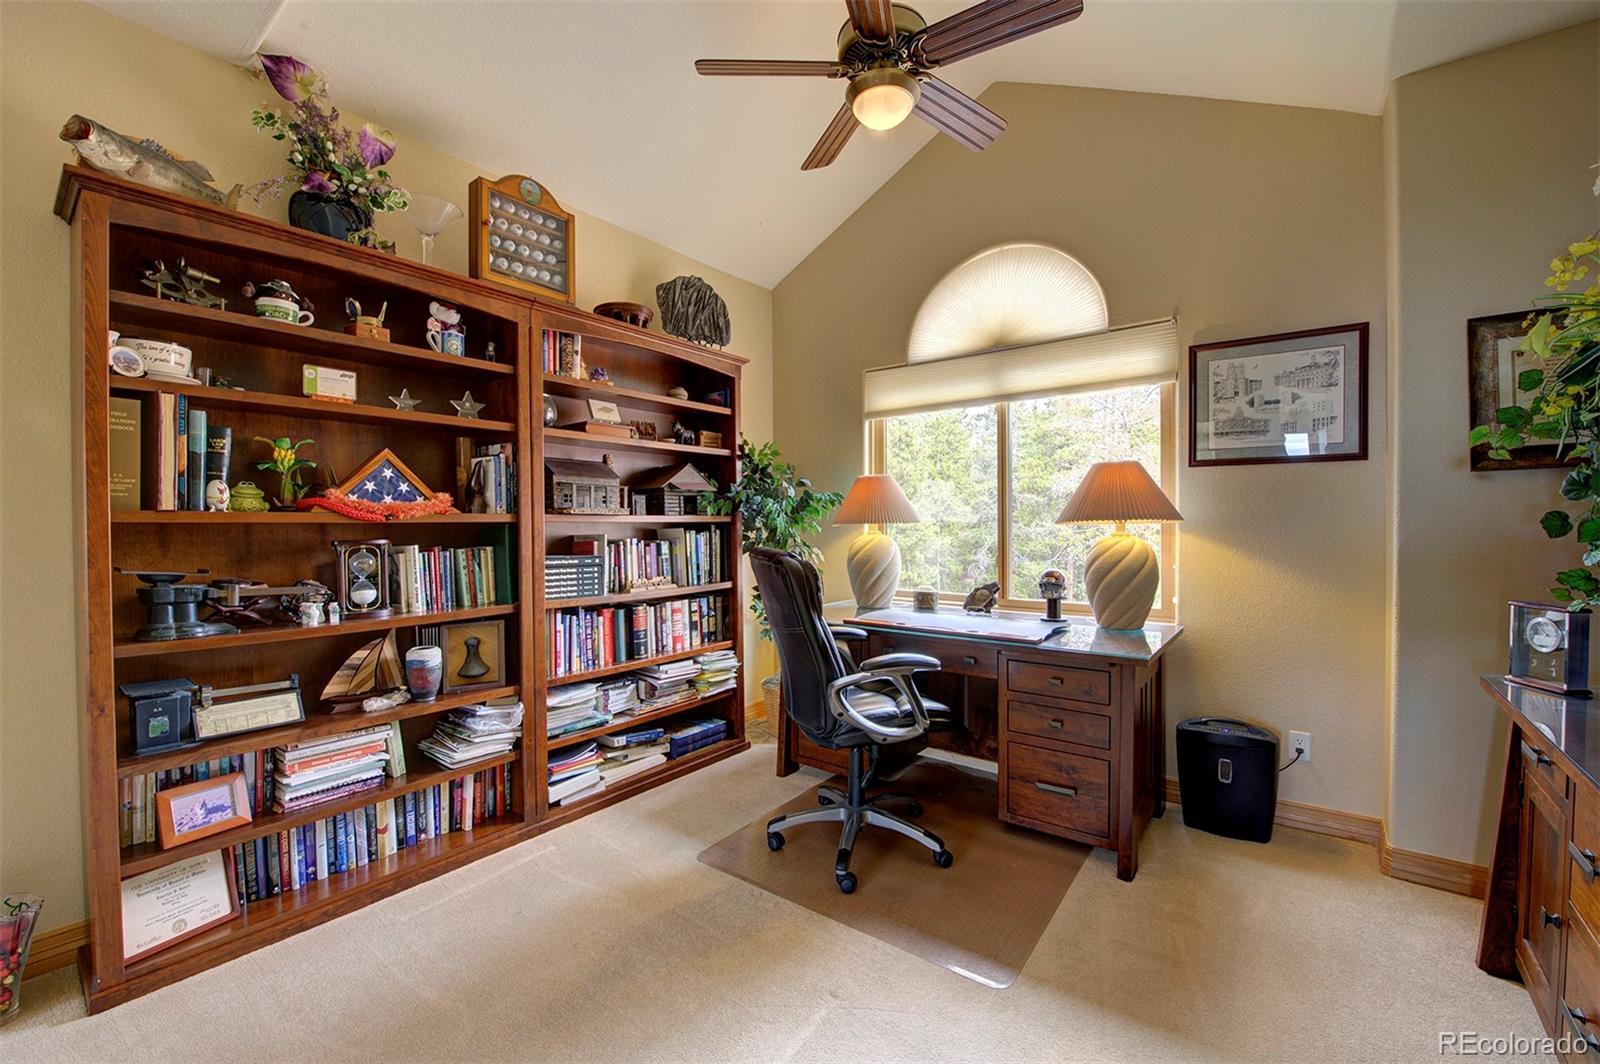 MLS# 9731389 - 28 - 28237 Belle Vista Drive, Conifer, CO 80433